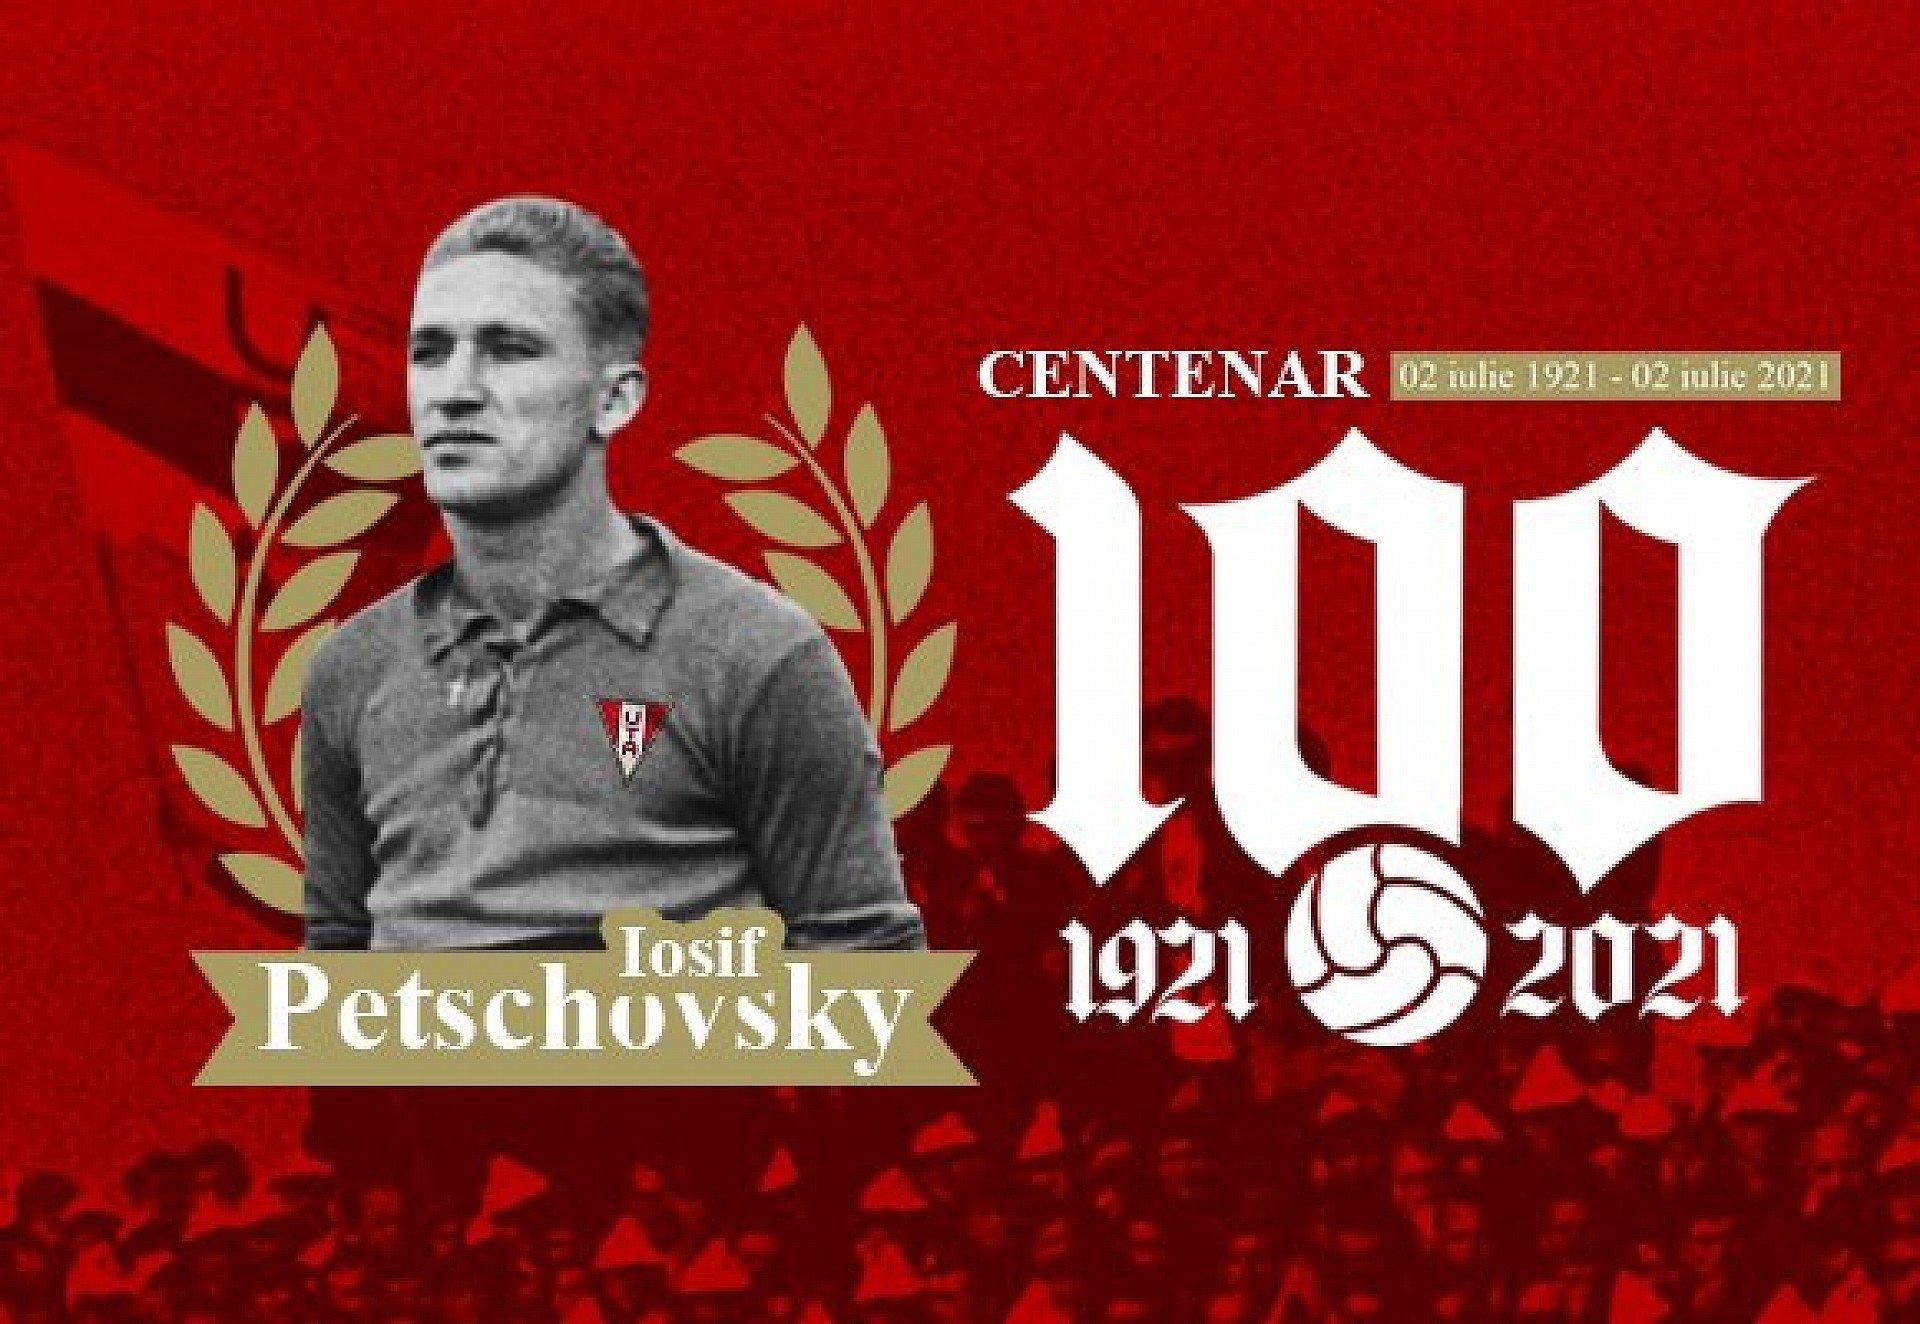 Imagine Centenar Iosif Petschovsky!